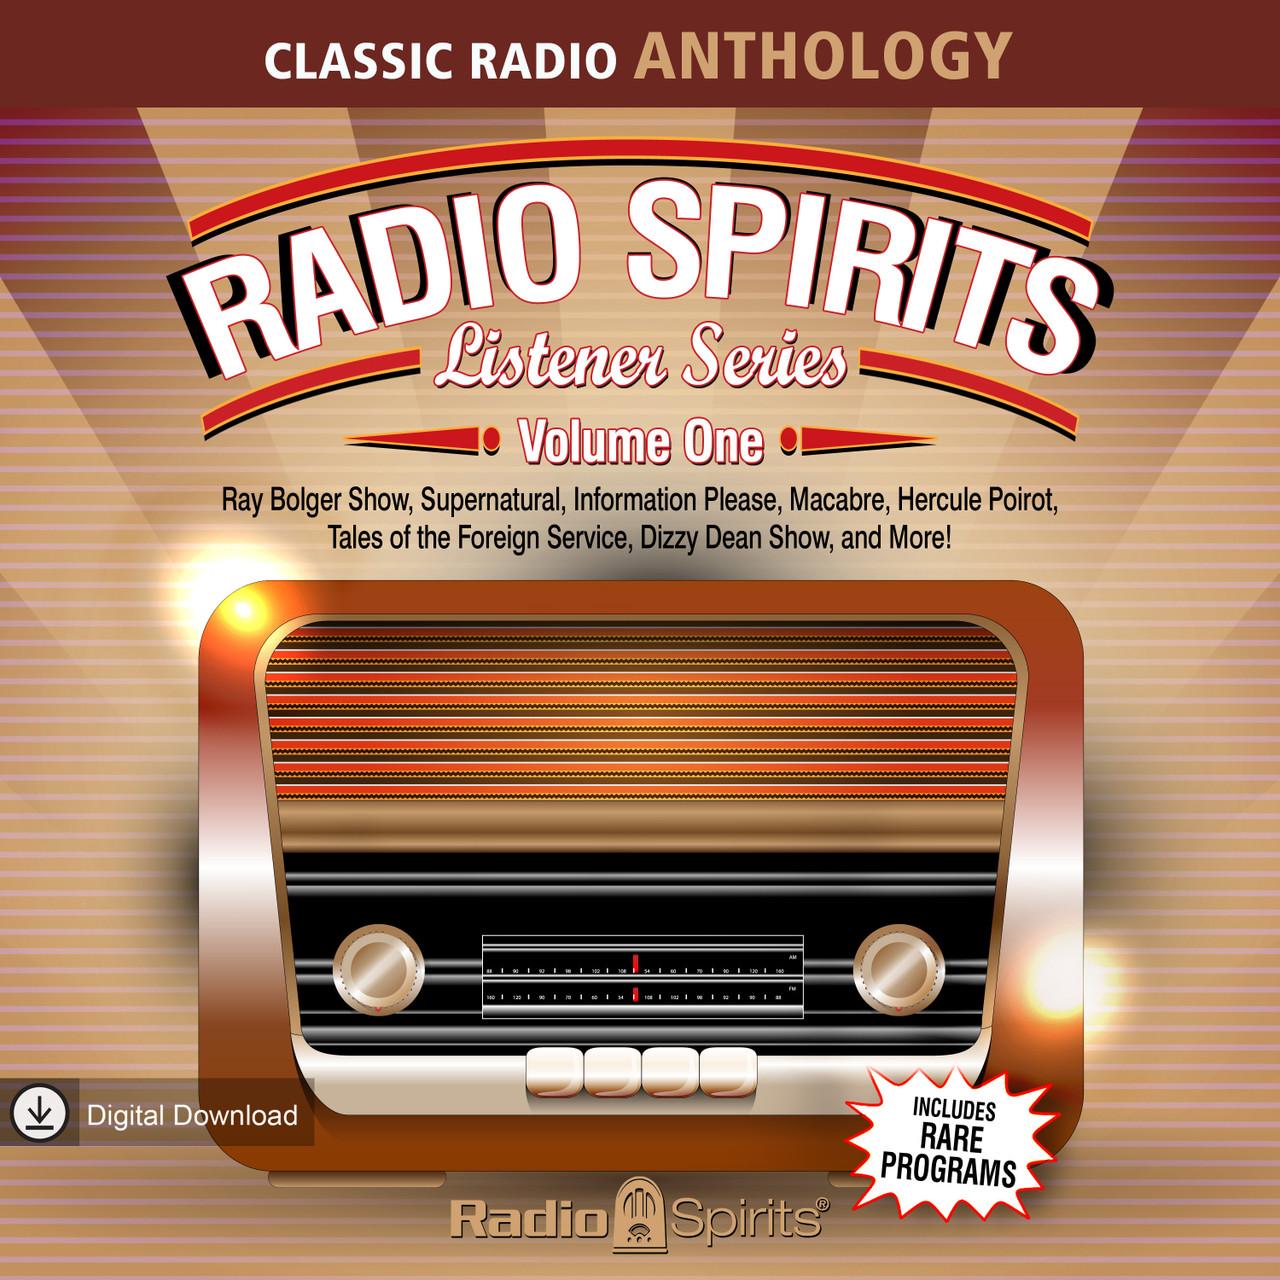 Radio Spirits Listener Series: Volume One